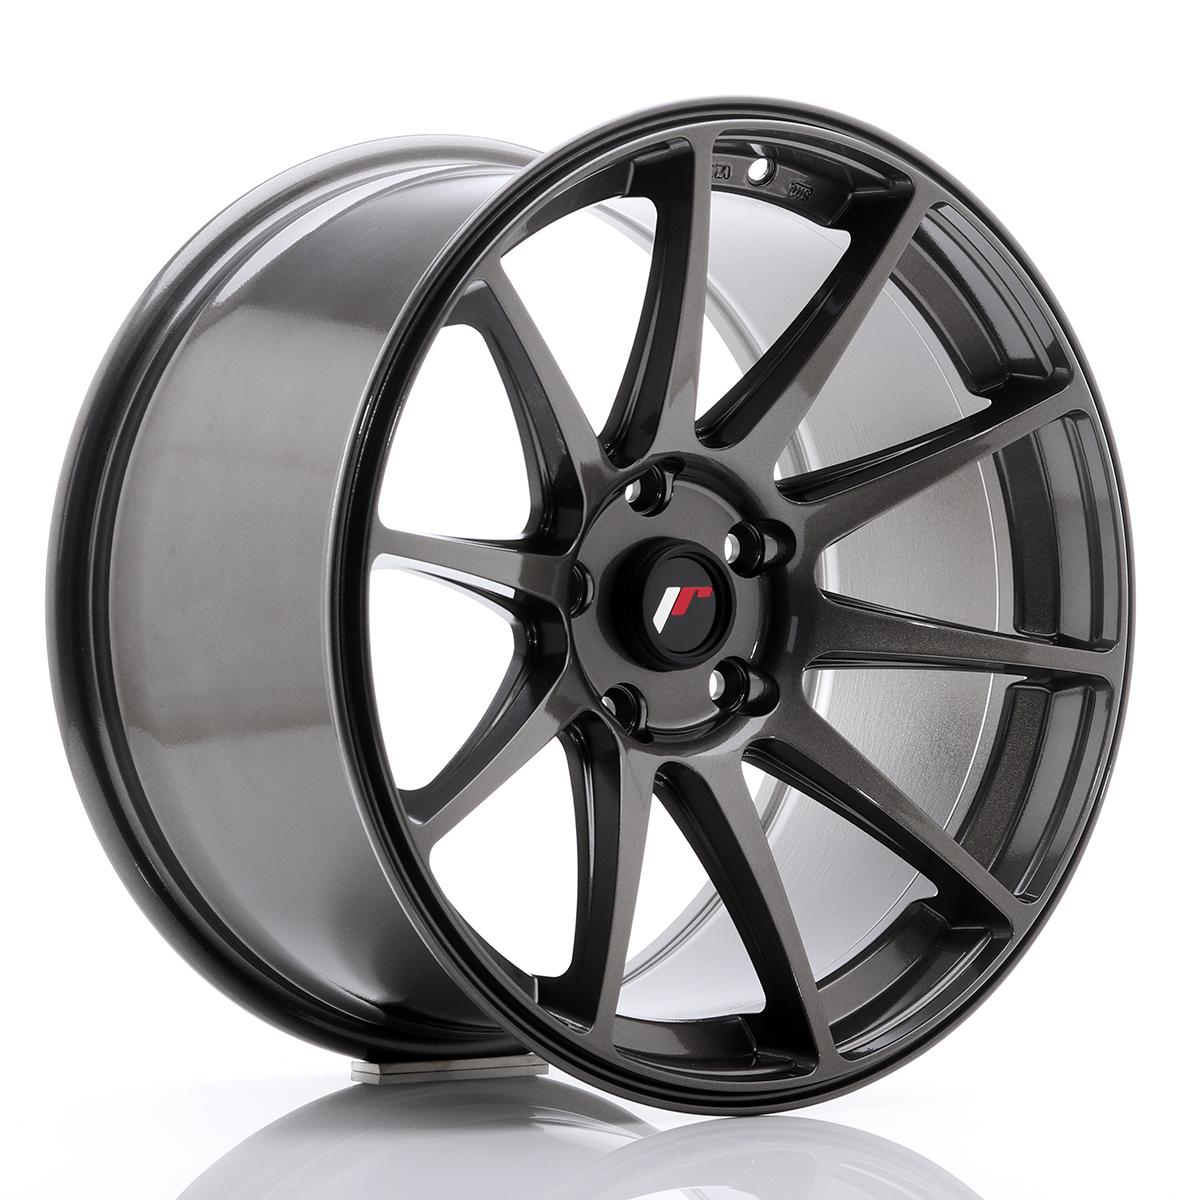 Japan Racing JR Wheels JR11 18x9.5 ET22 5x120 5x114.3 Hyper Gray